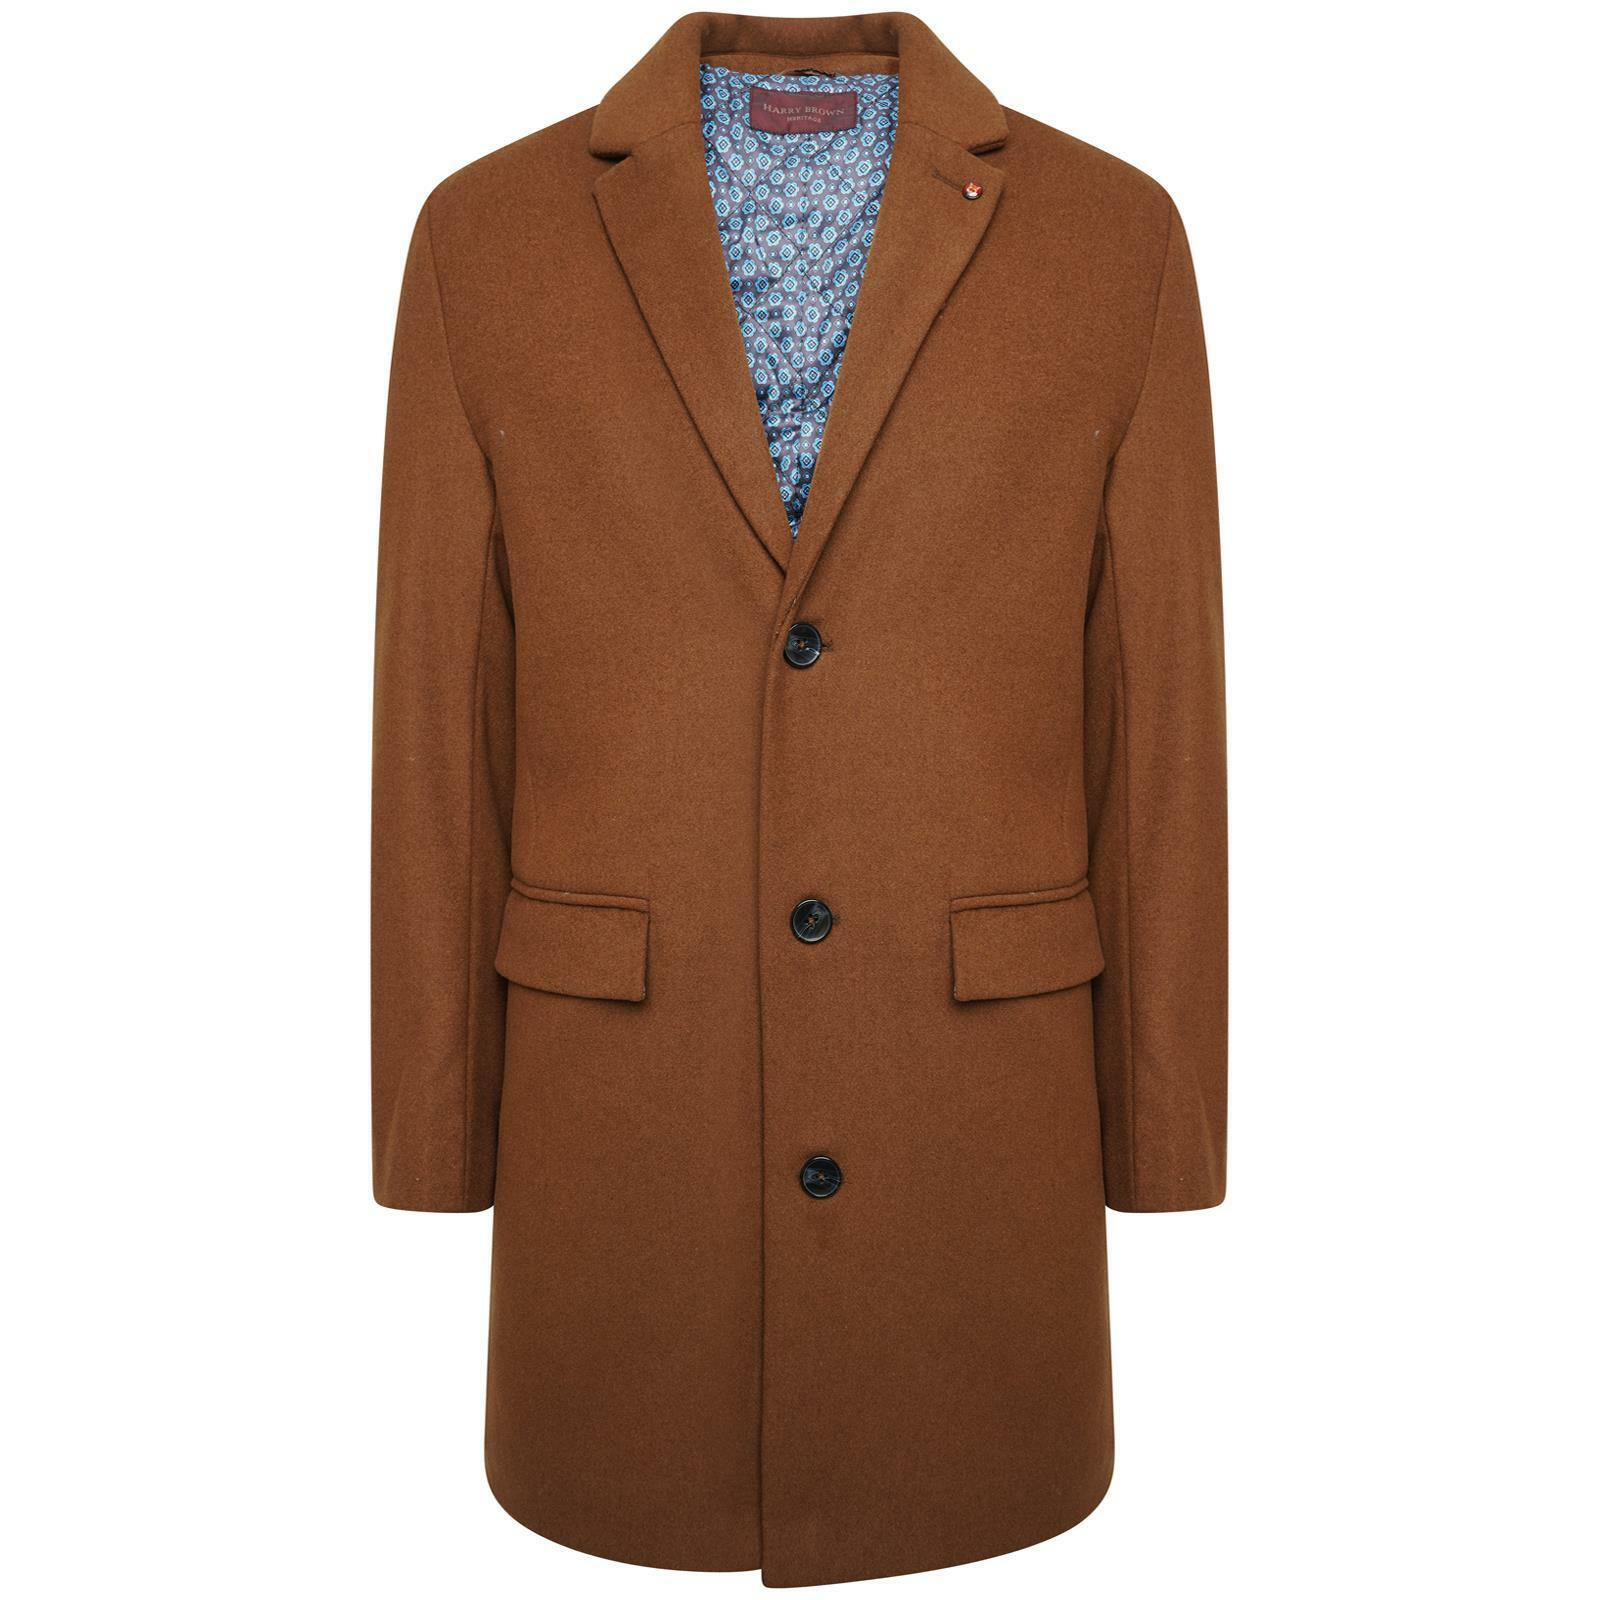 Harry Braun Wool Overcoat in Taupe